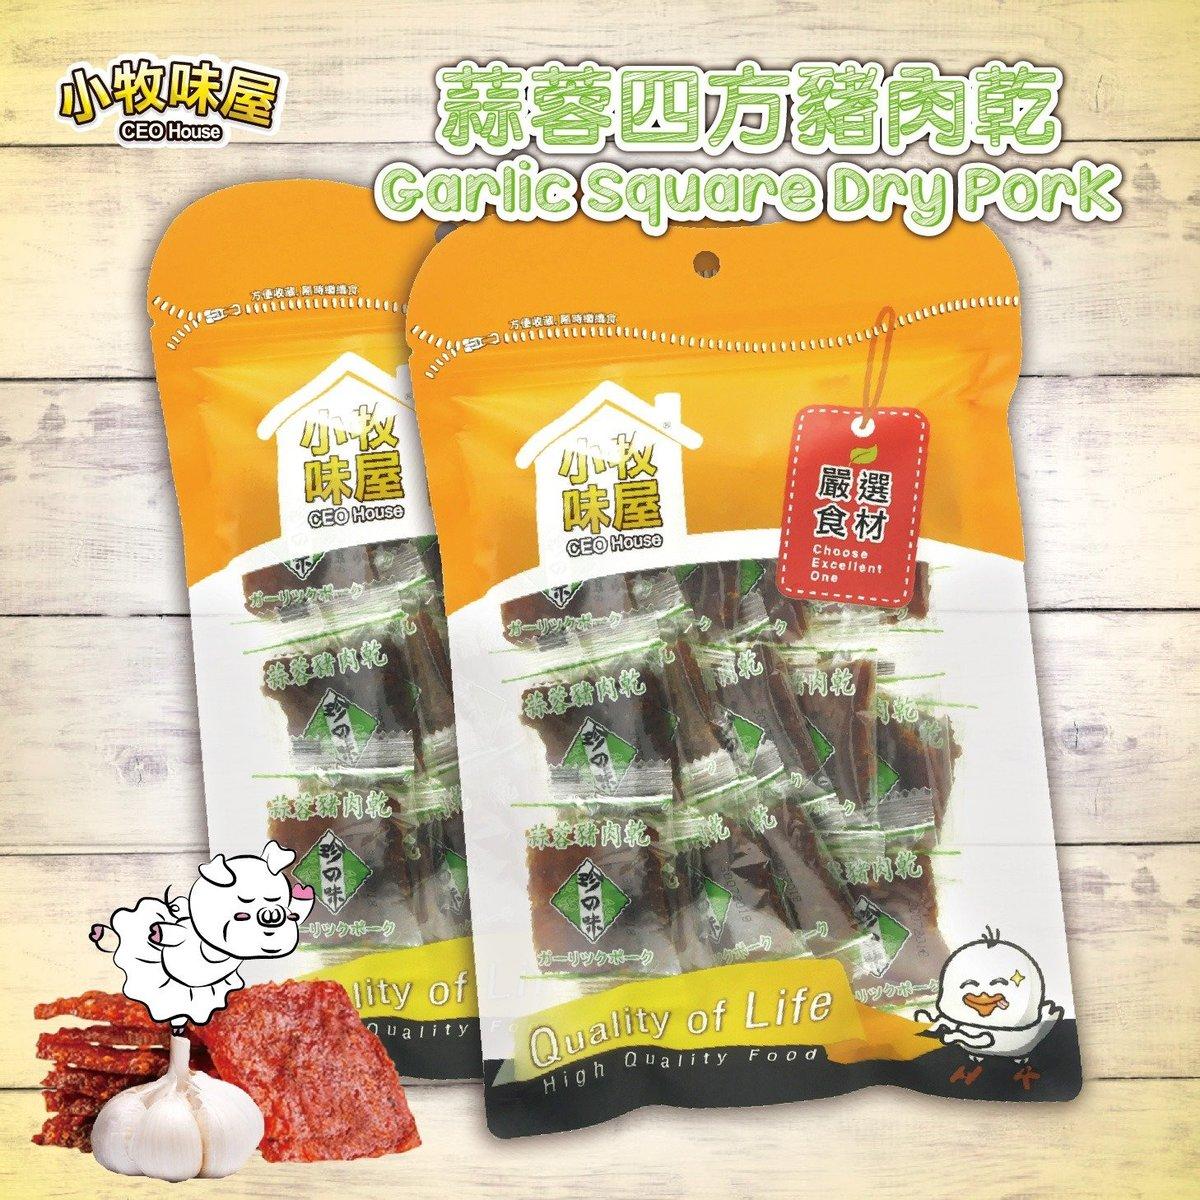 Garlic Square Dry Pork x 2 packs